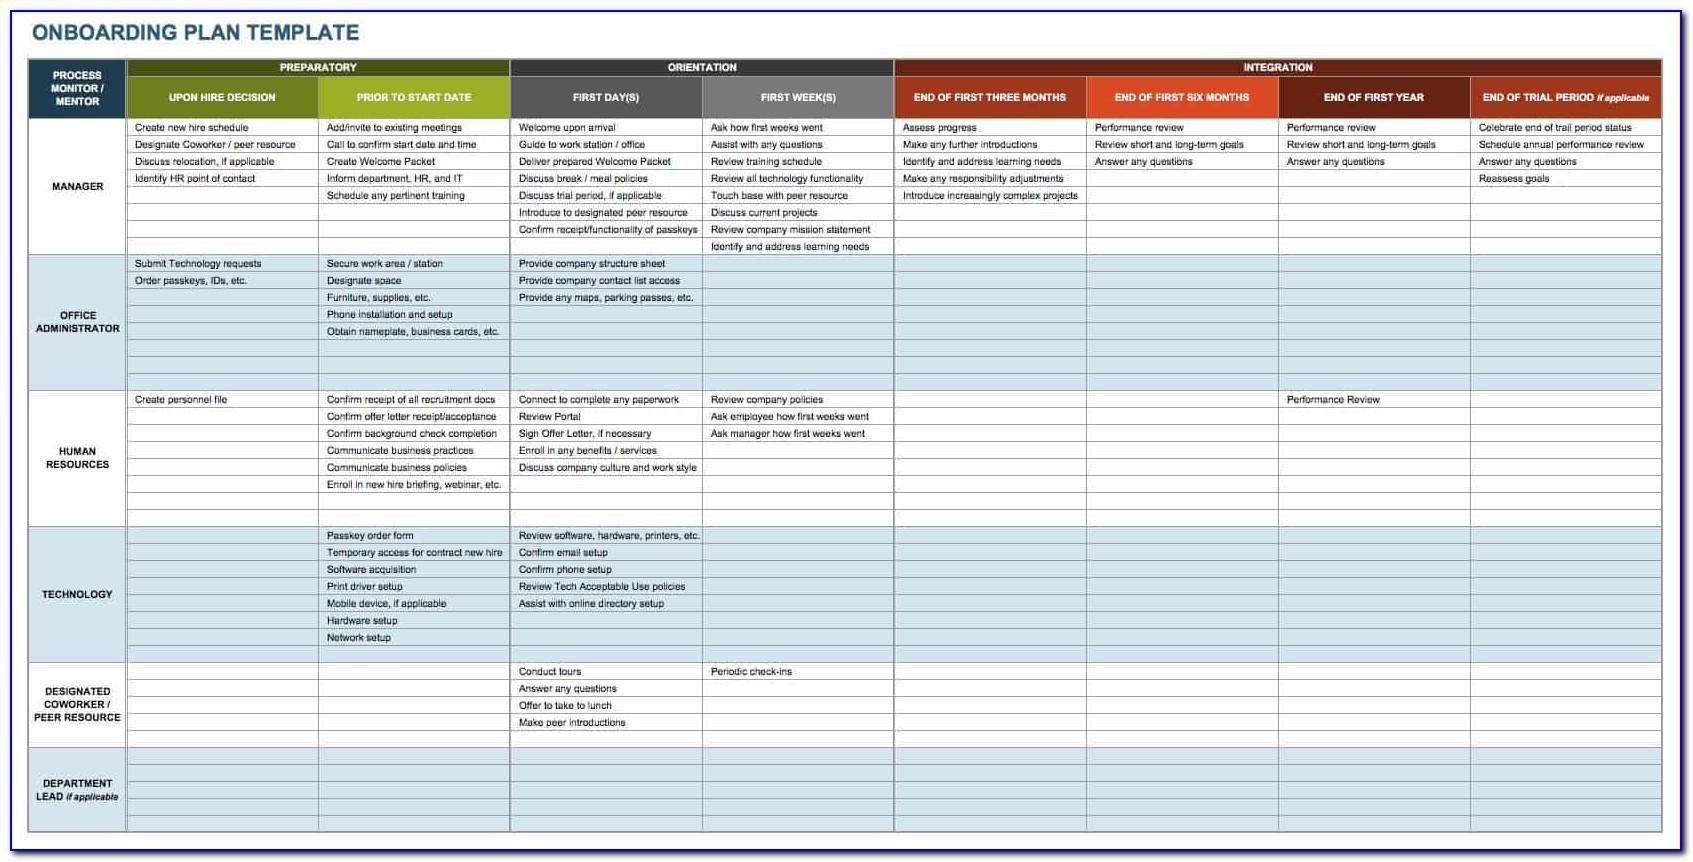 Onboarding Template Excel